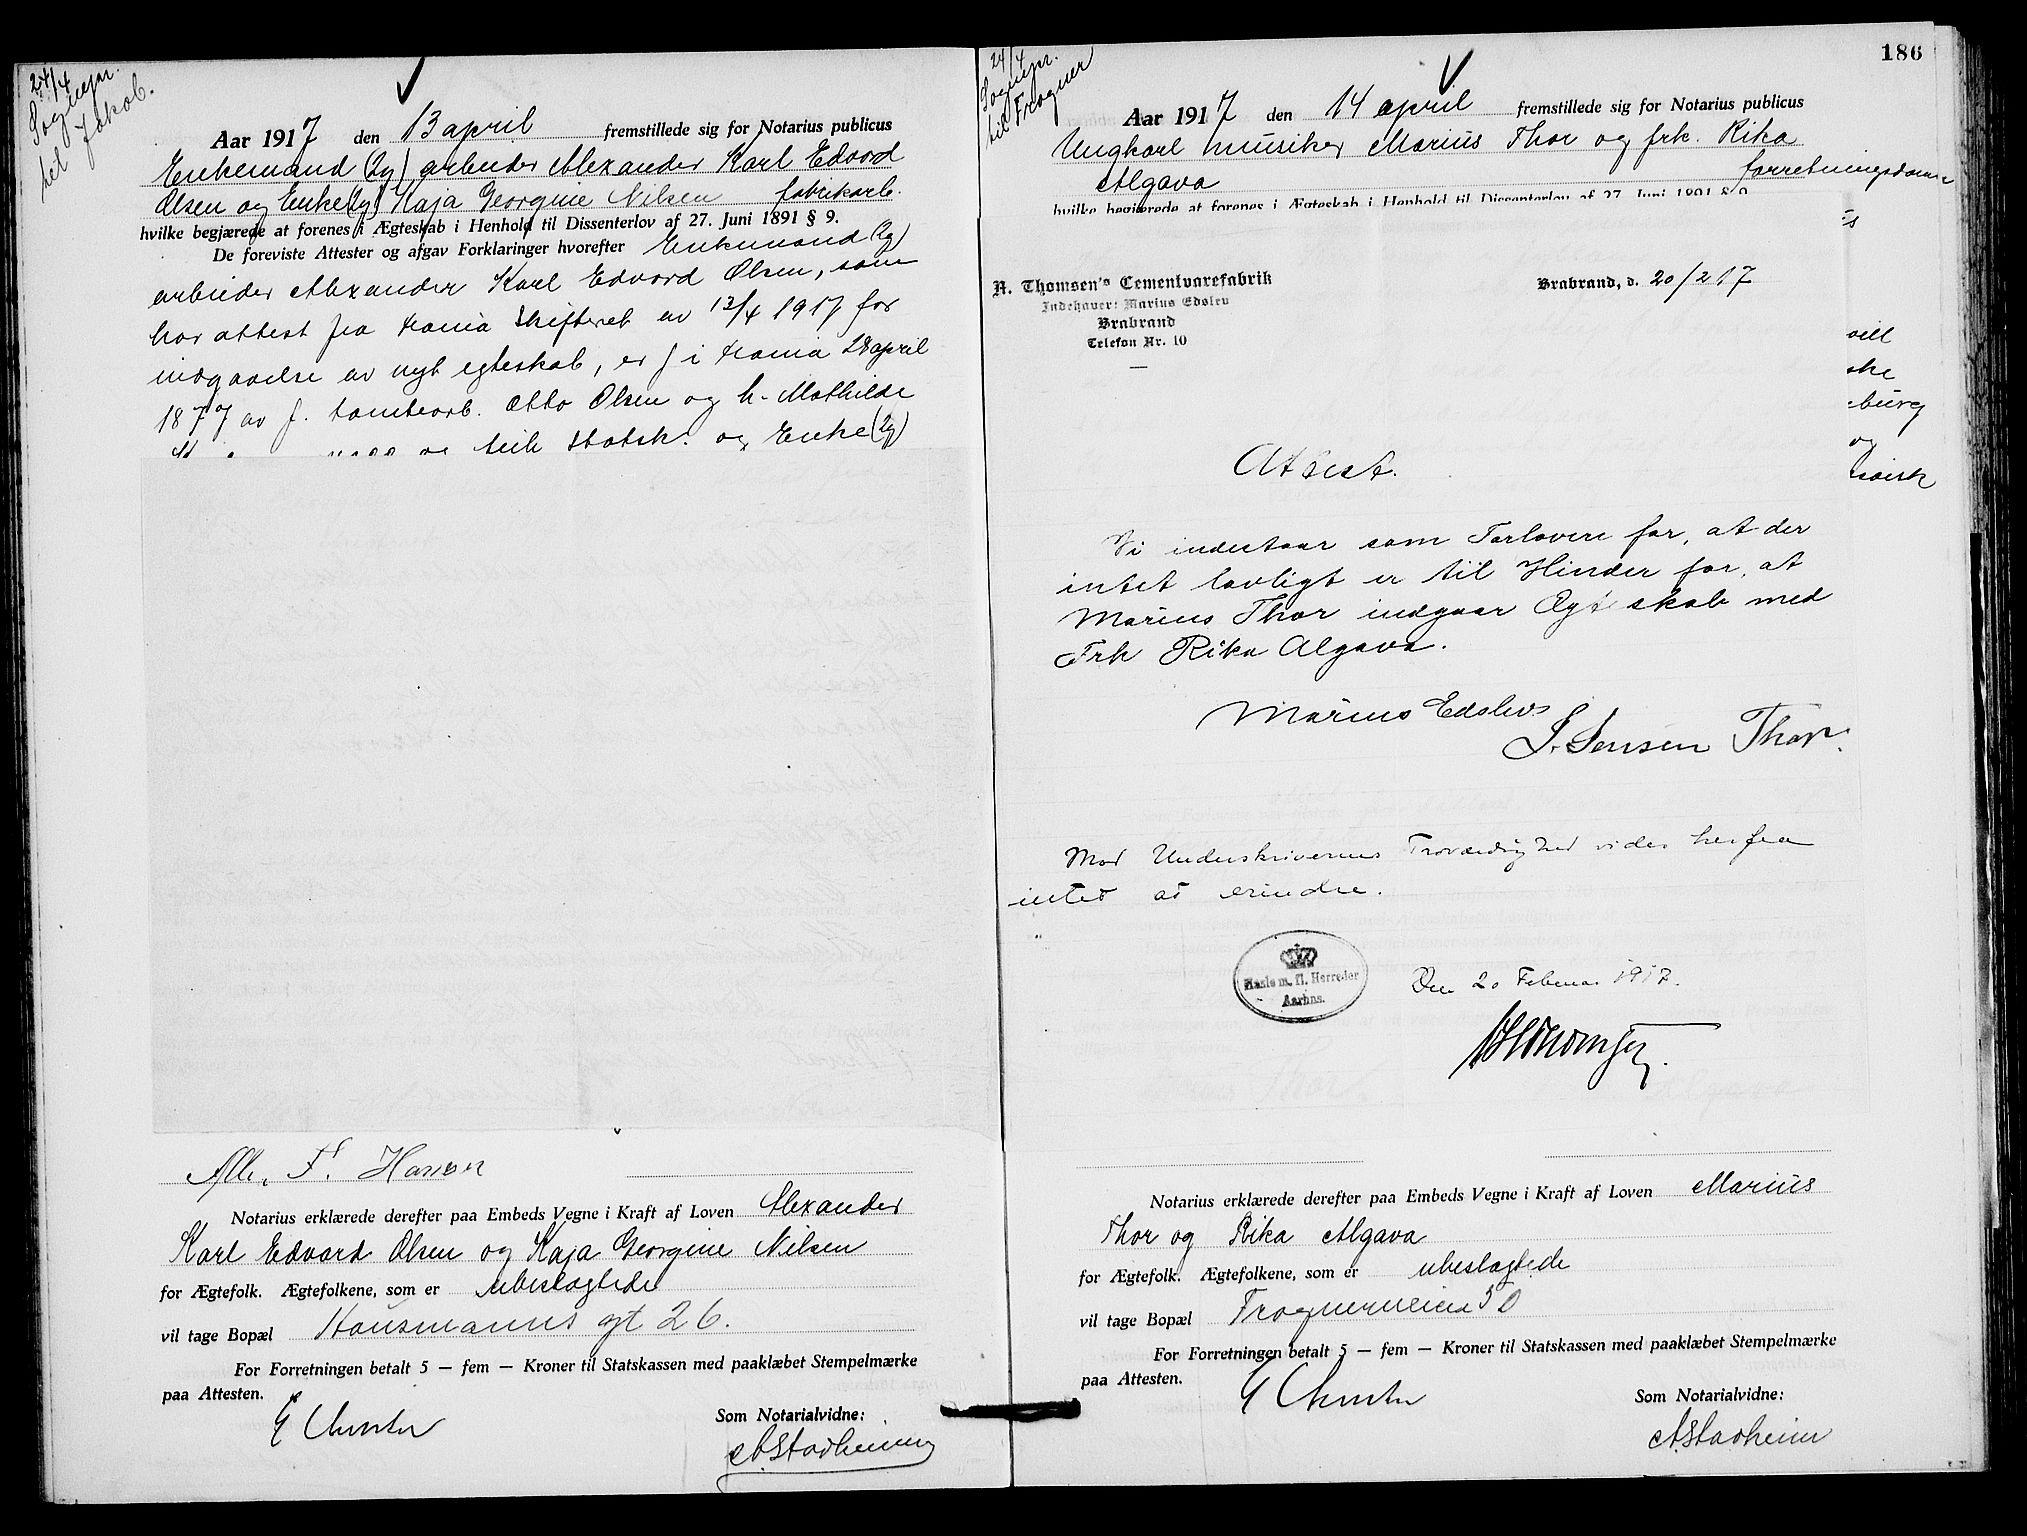 SAO, Oslo byfogd avd. I, L/Lb/Lbb/L0011: Notarialprotokoll, rekke II: Vigsler, 1916-1918, s. 185b-186a